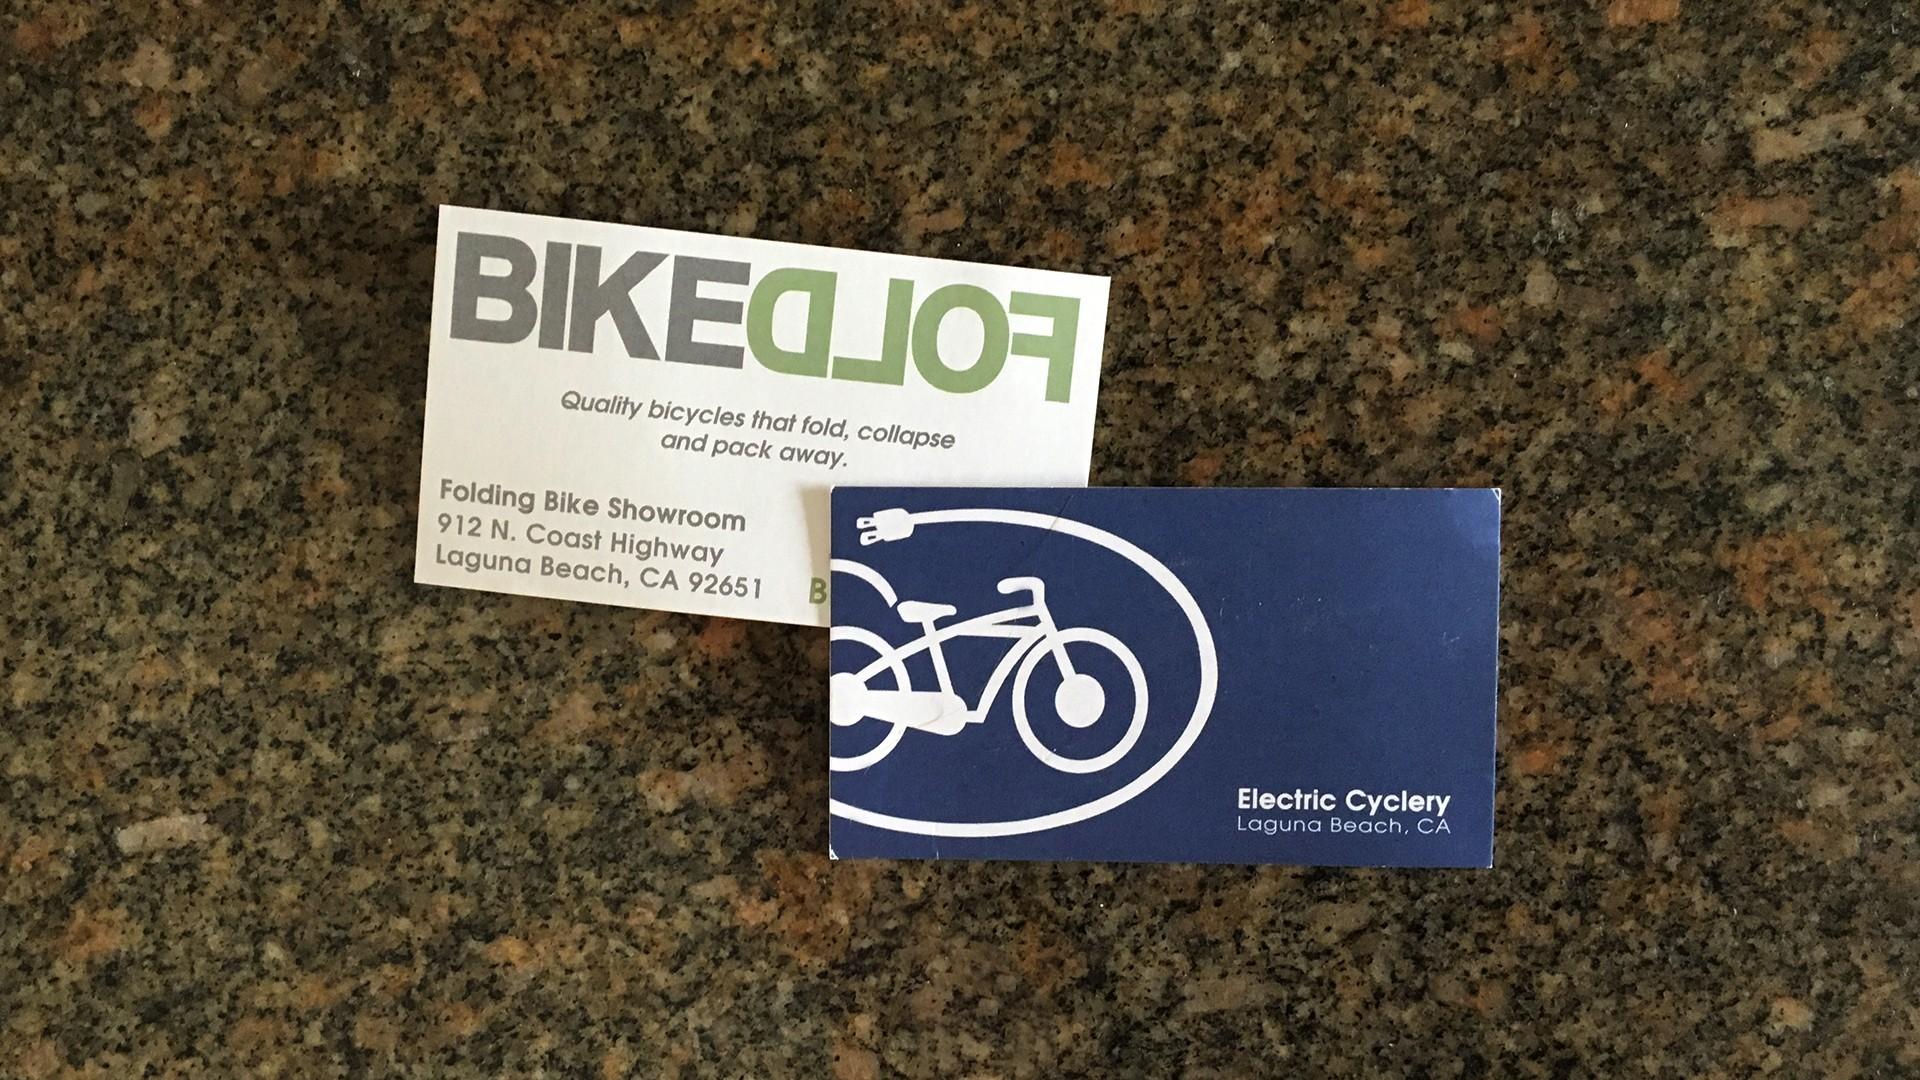 Electric Cyclery - Bike Fold